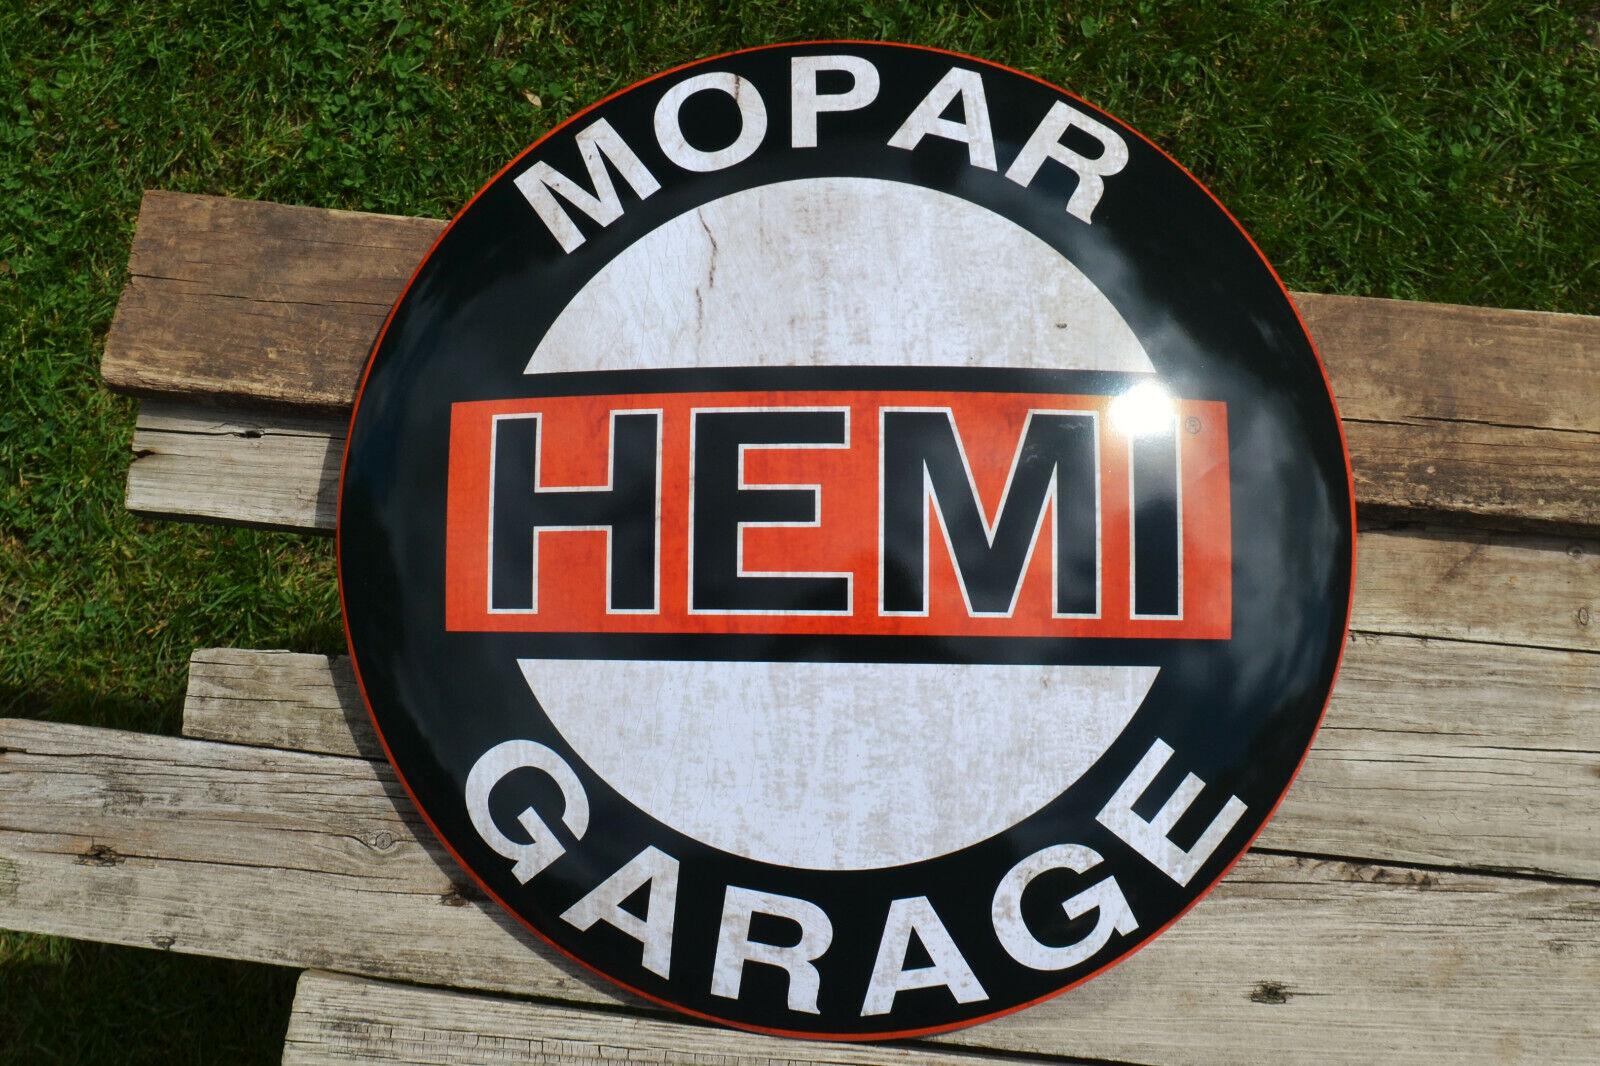 MOPAR Hemi Garage Embossed Shaped Metal Sign